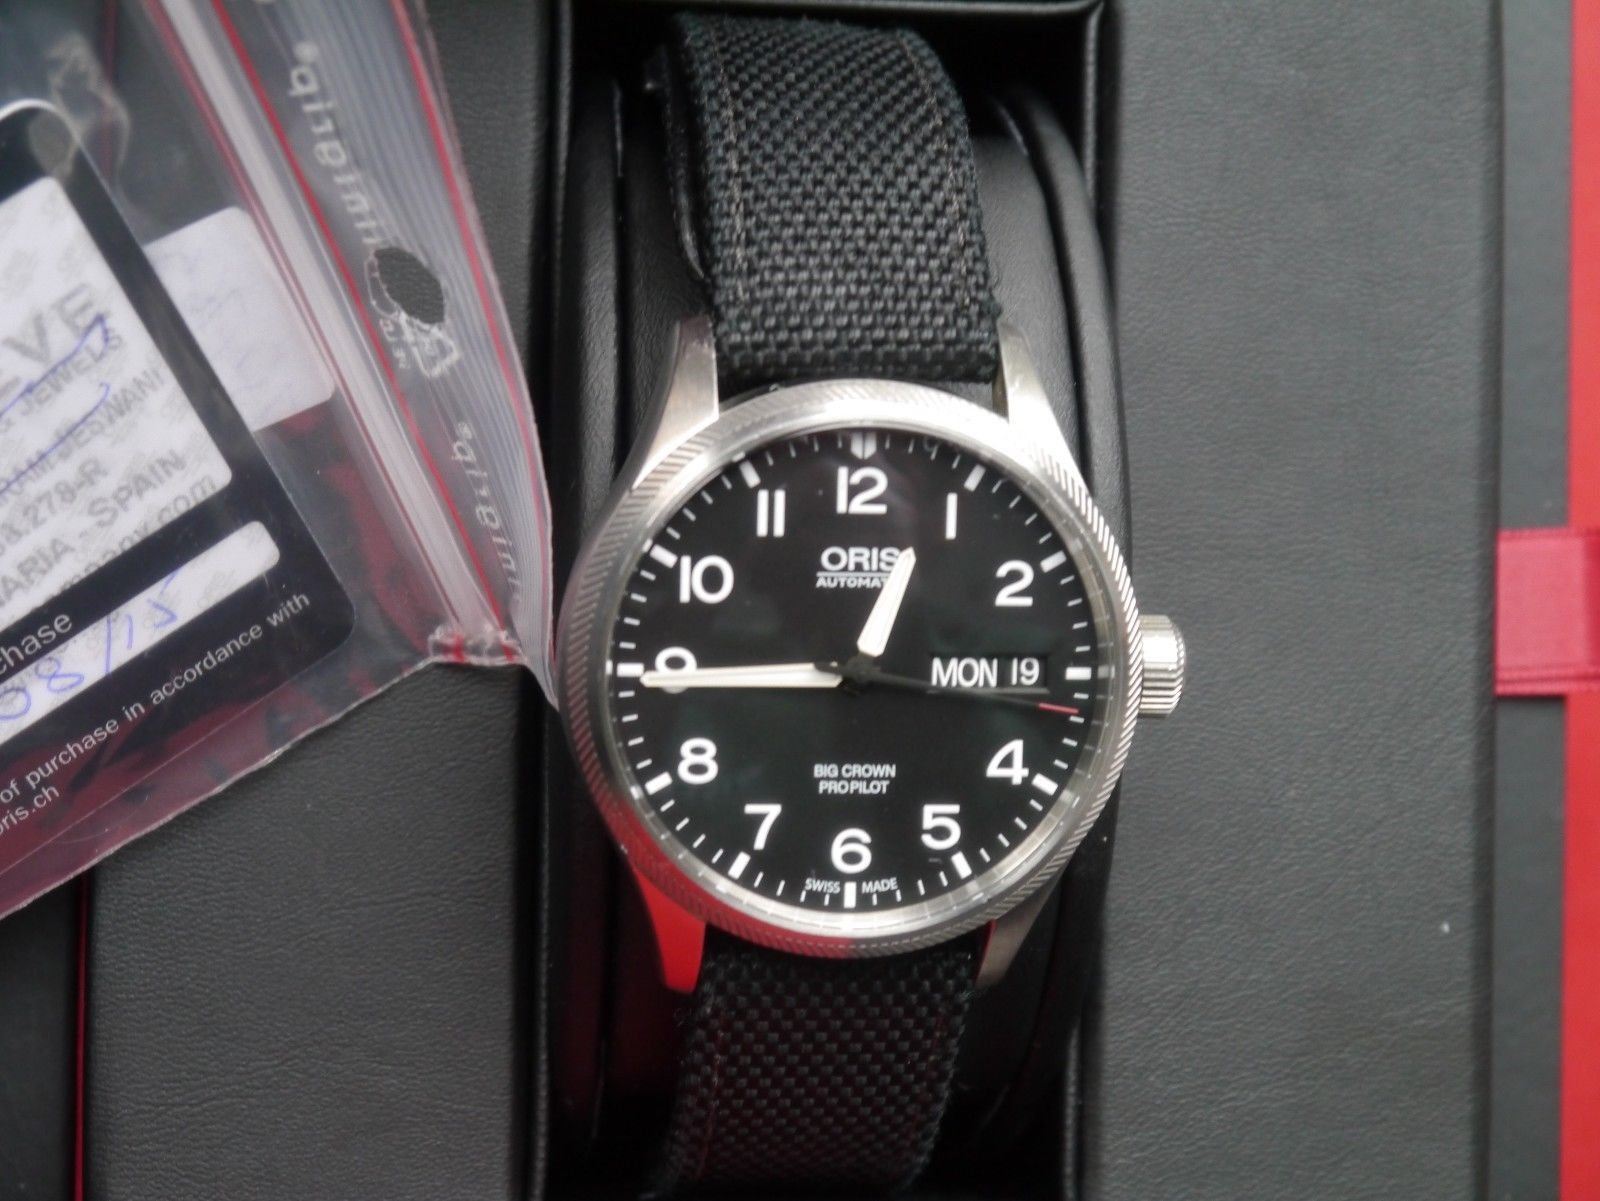 Oris Watch Big Crown Propilot Day Date Textile Strap Oris Watches Strap Watches